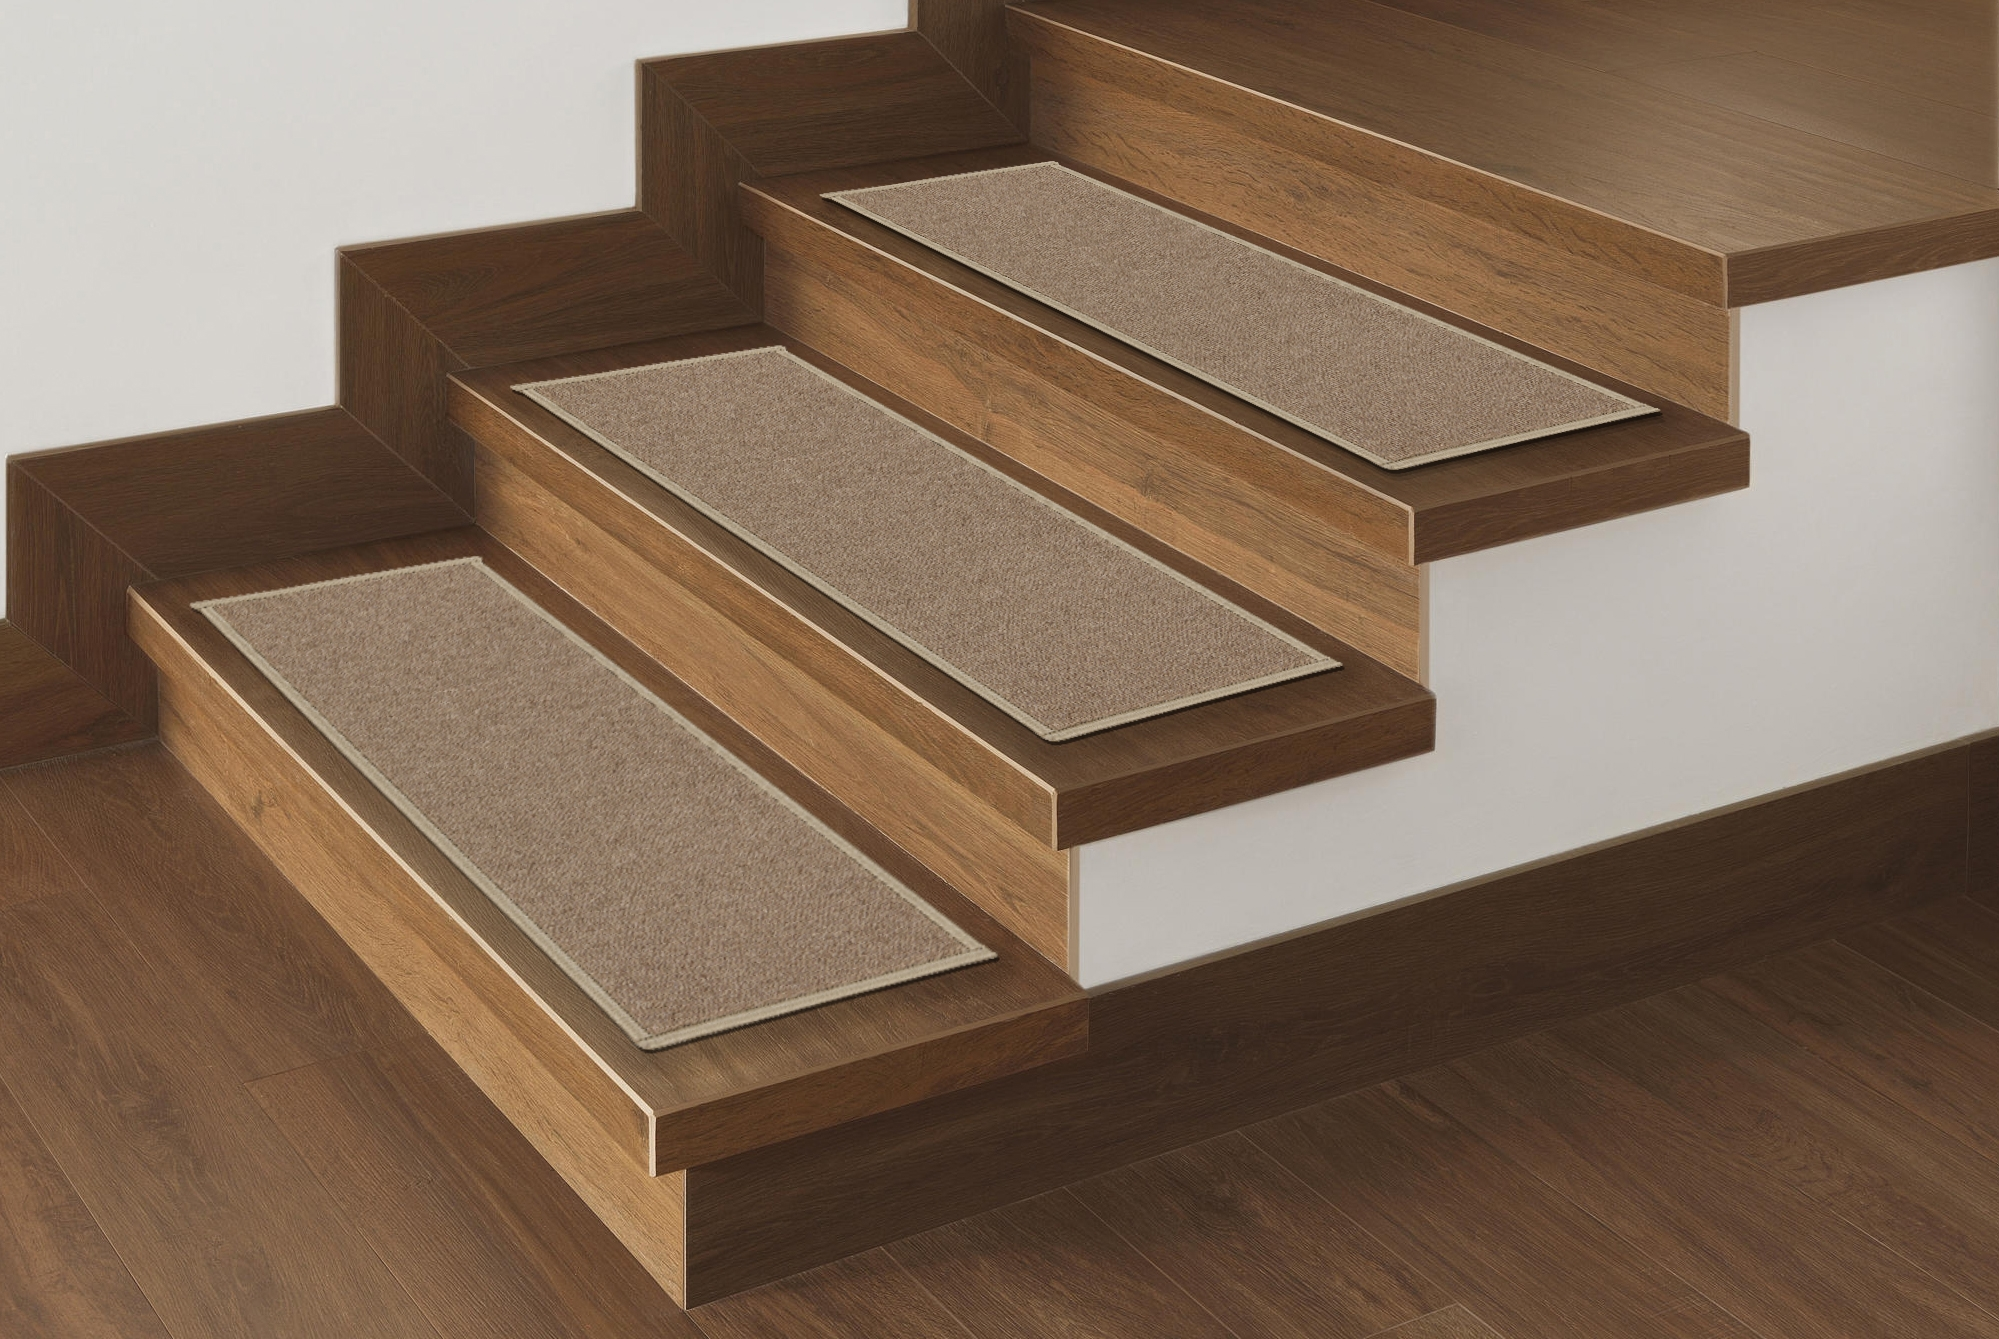 Ottomanson Non Slip Rubber Backing Stair Tread Dark Beige 8 5 X   Beige Carpet On Stairs   Living Room   Art Deco   Design   Pattern   Builder Grade